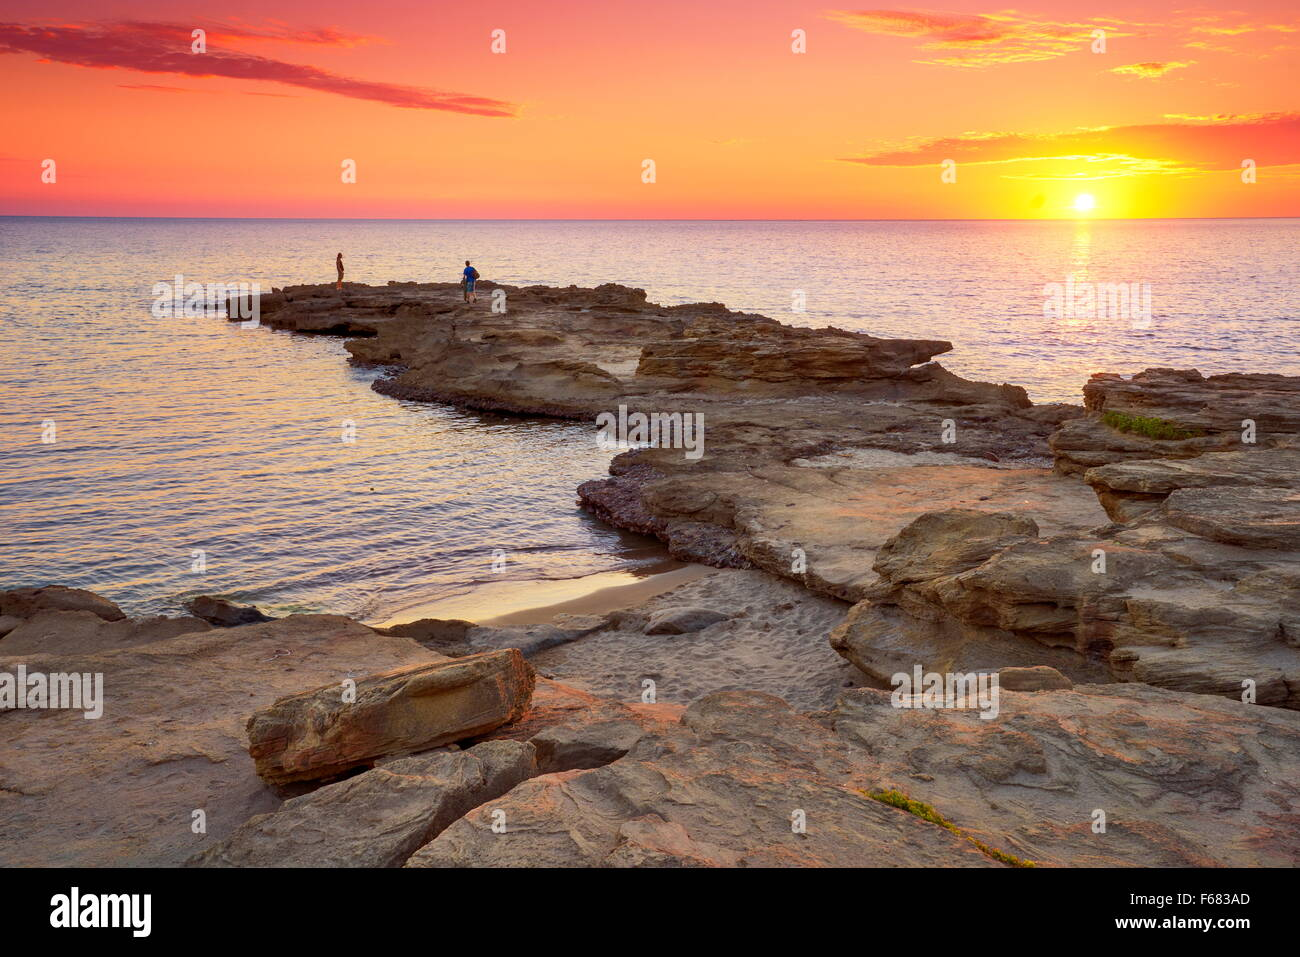 Sunset at the Riviera del Corallo, Sardinia Island, Italy Stock Photo